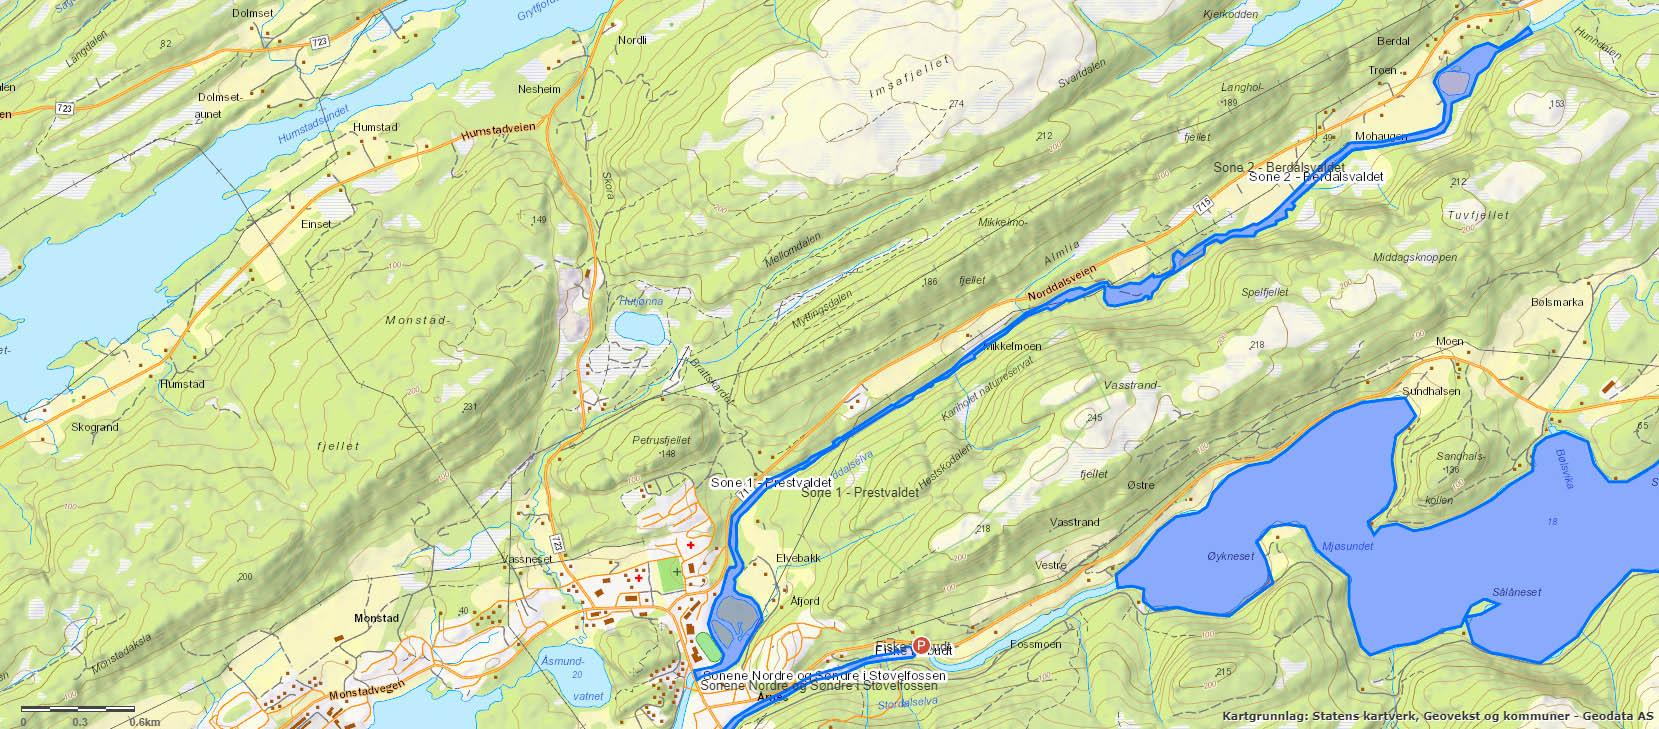 Nordalselva kart